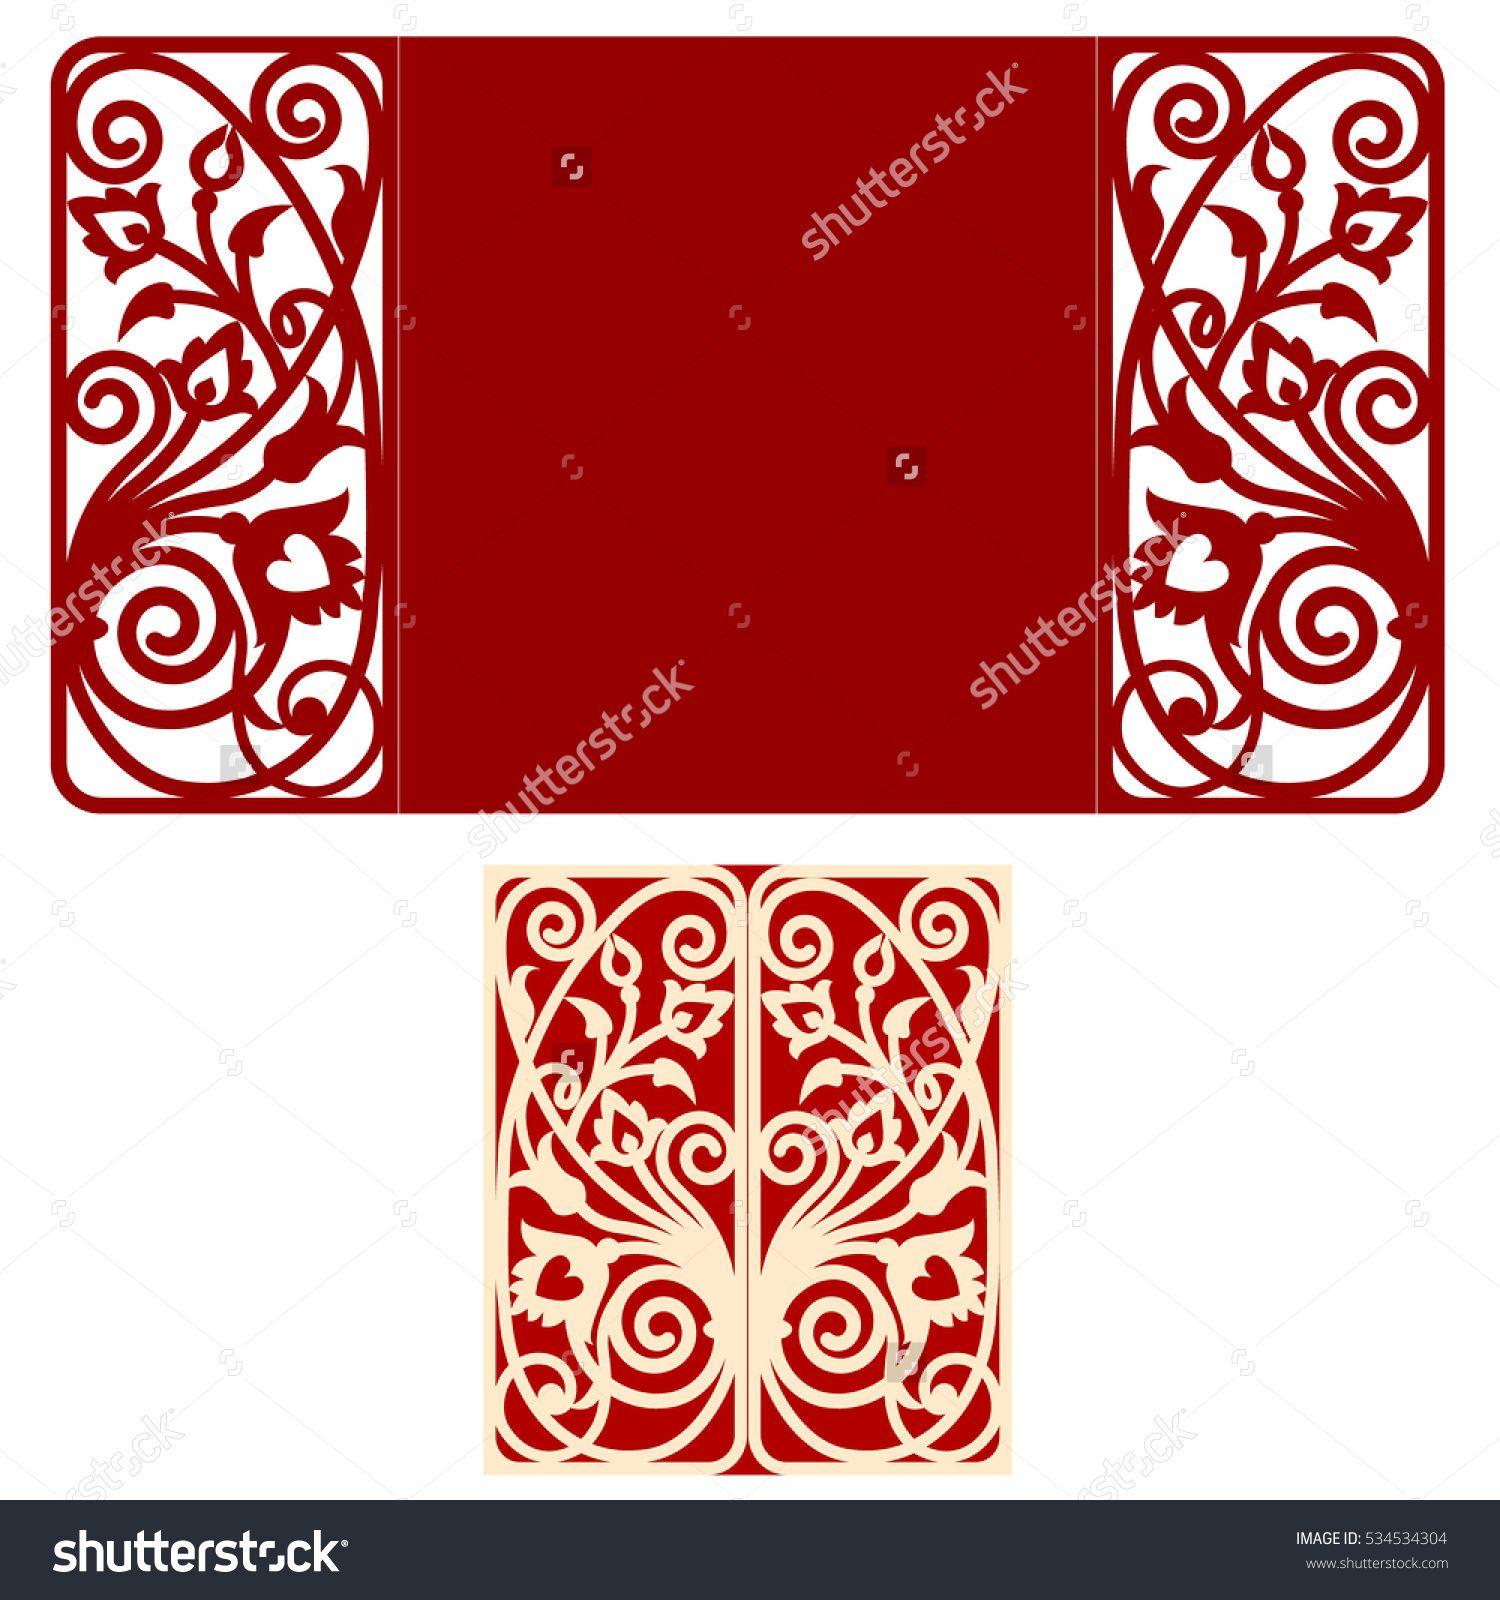 stock-vector-card-for-laser-cutting-vs-die-cutting-laser-cut-wedding ...